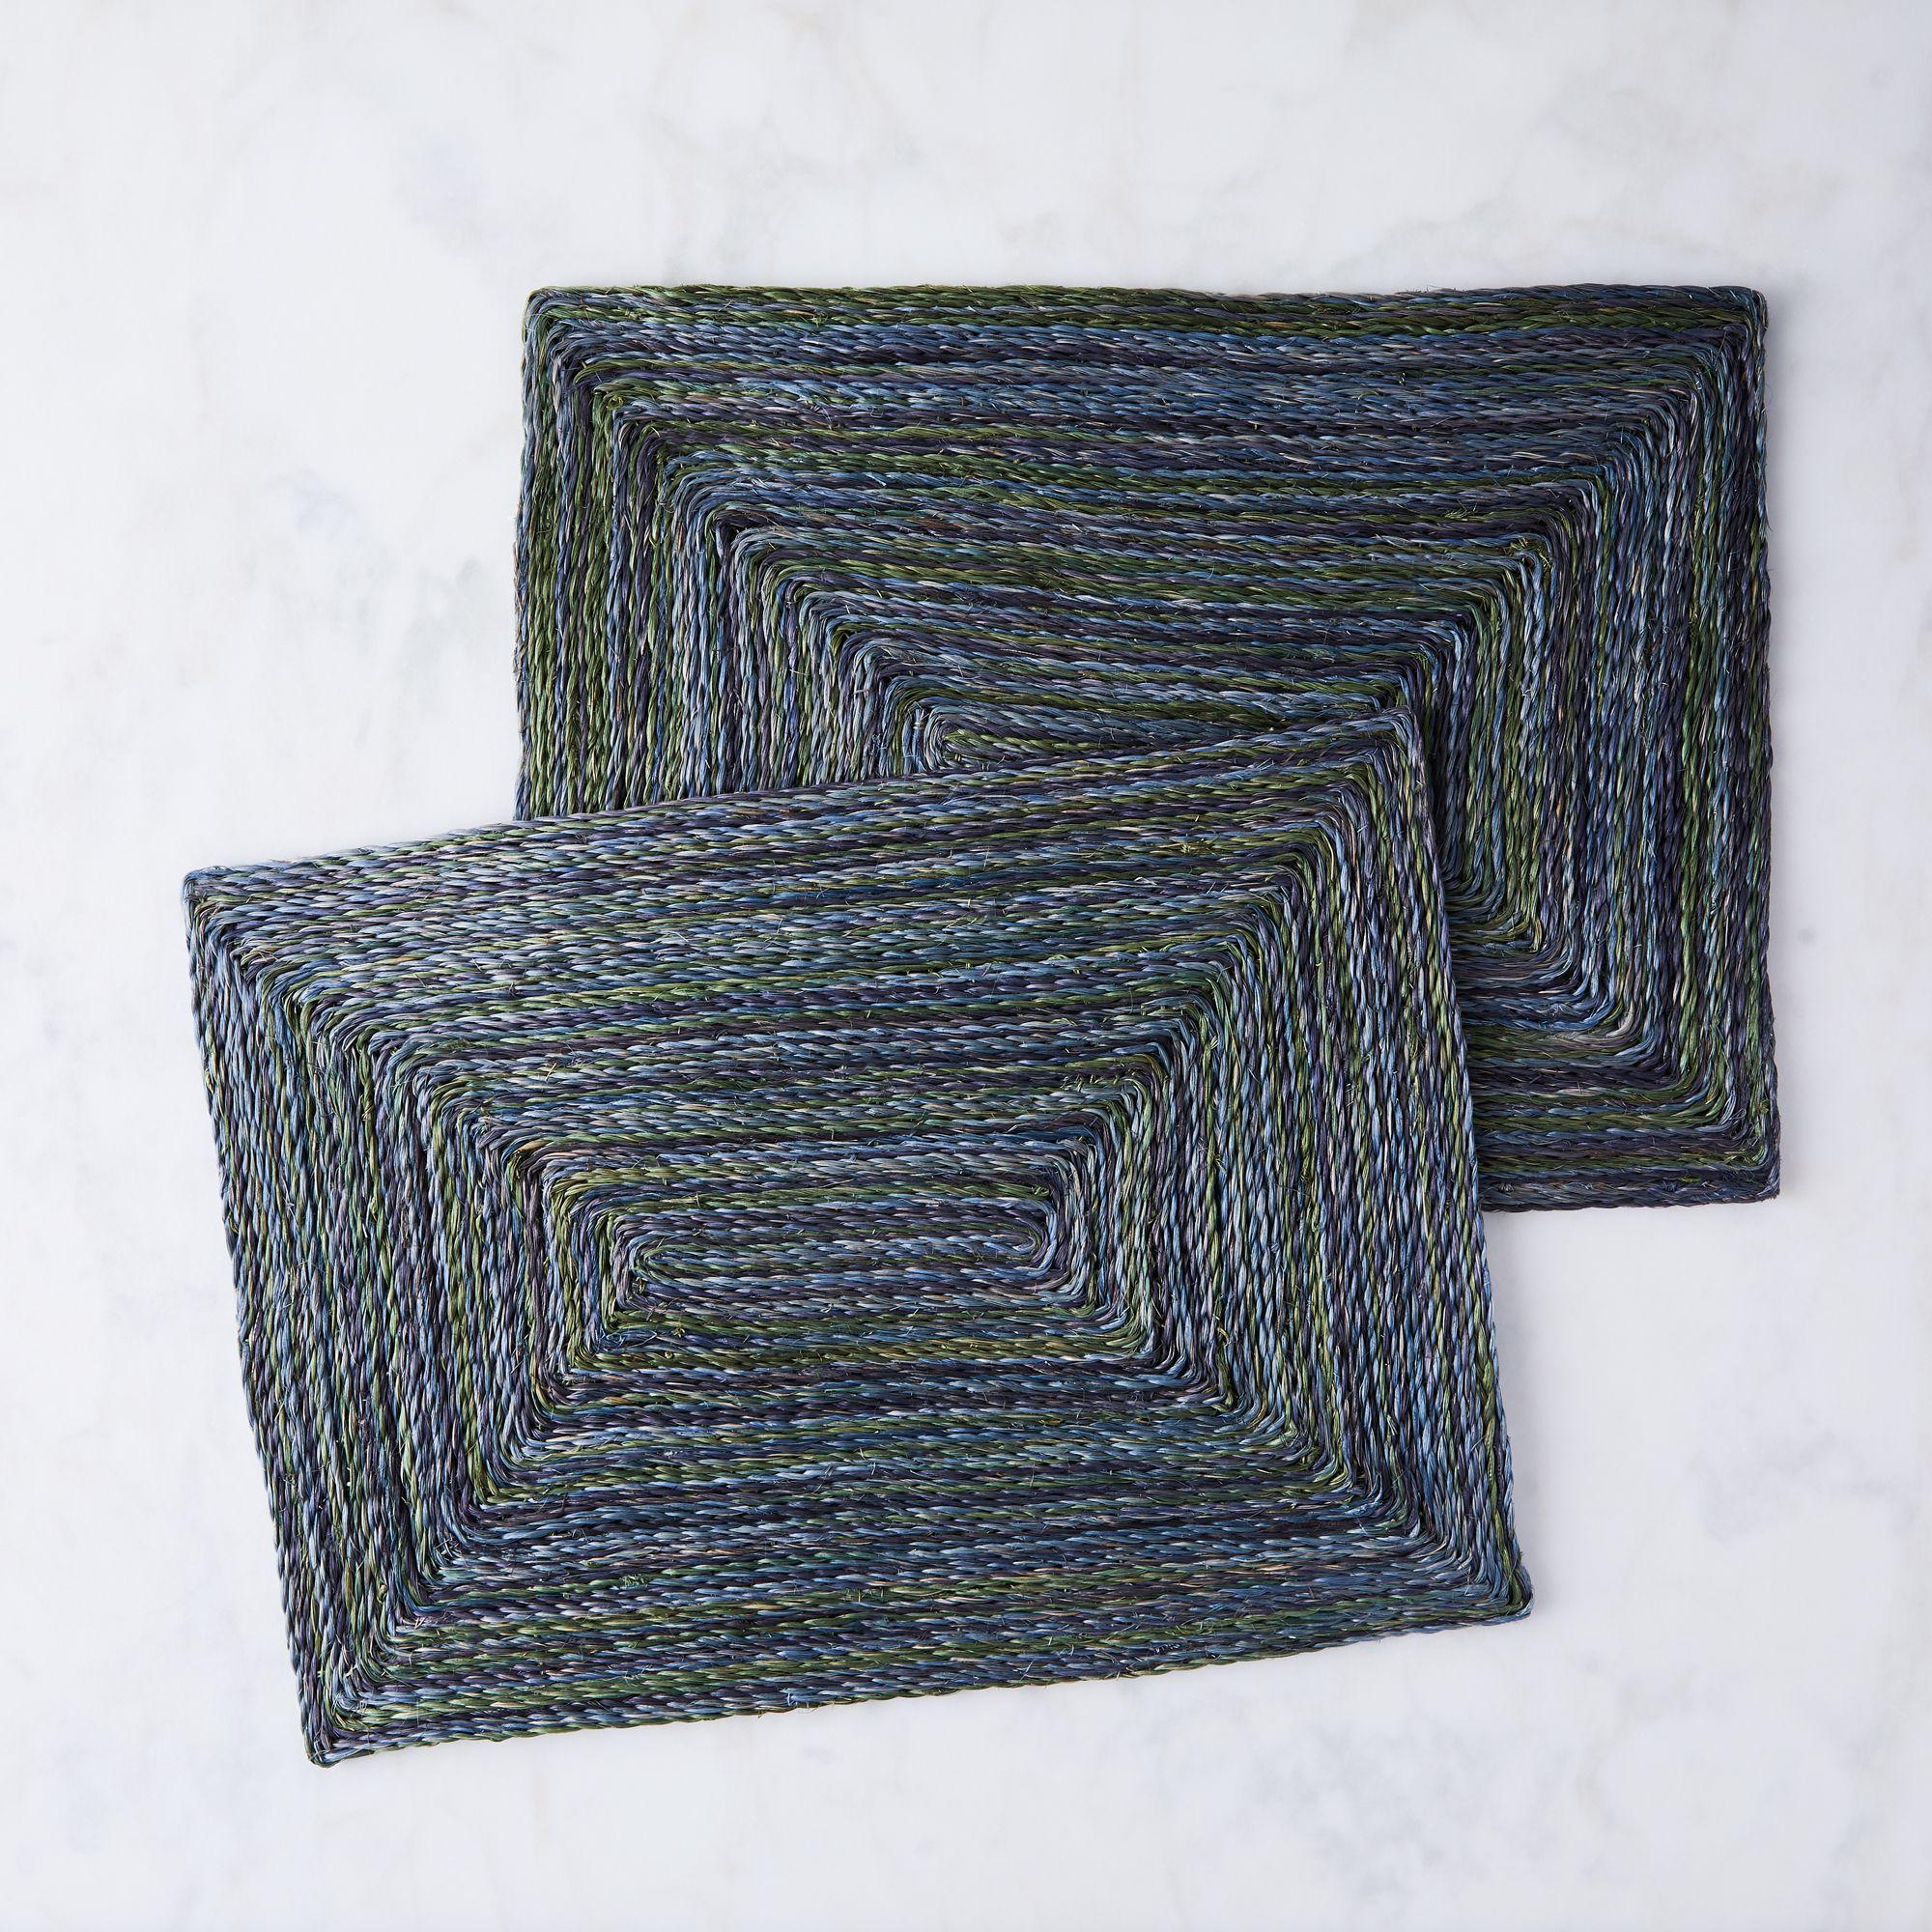 Blue Pheasant Twisted Abaca Ocean Placemats (Set of 2)  - Rectangular